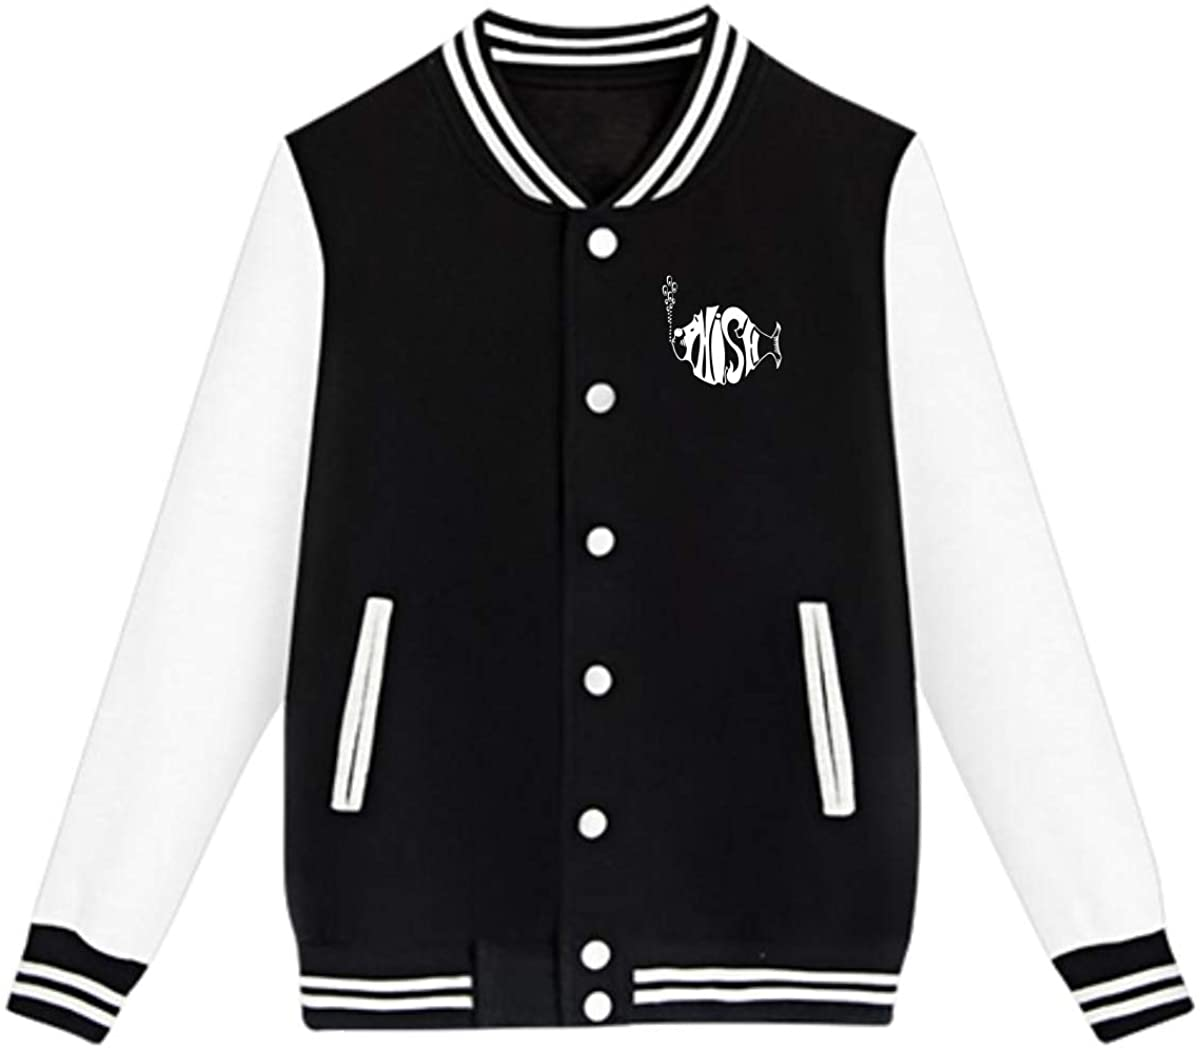 AHUAHUA Phish Music Band Unisex Youth Boys and Girls Sweatshirt Baseball Uniform Jacket Sport Coat